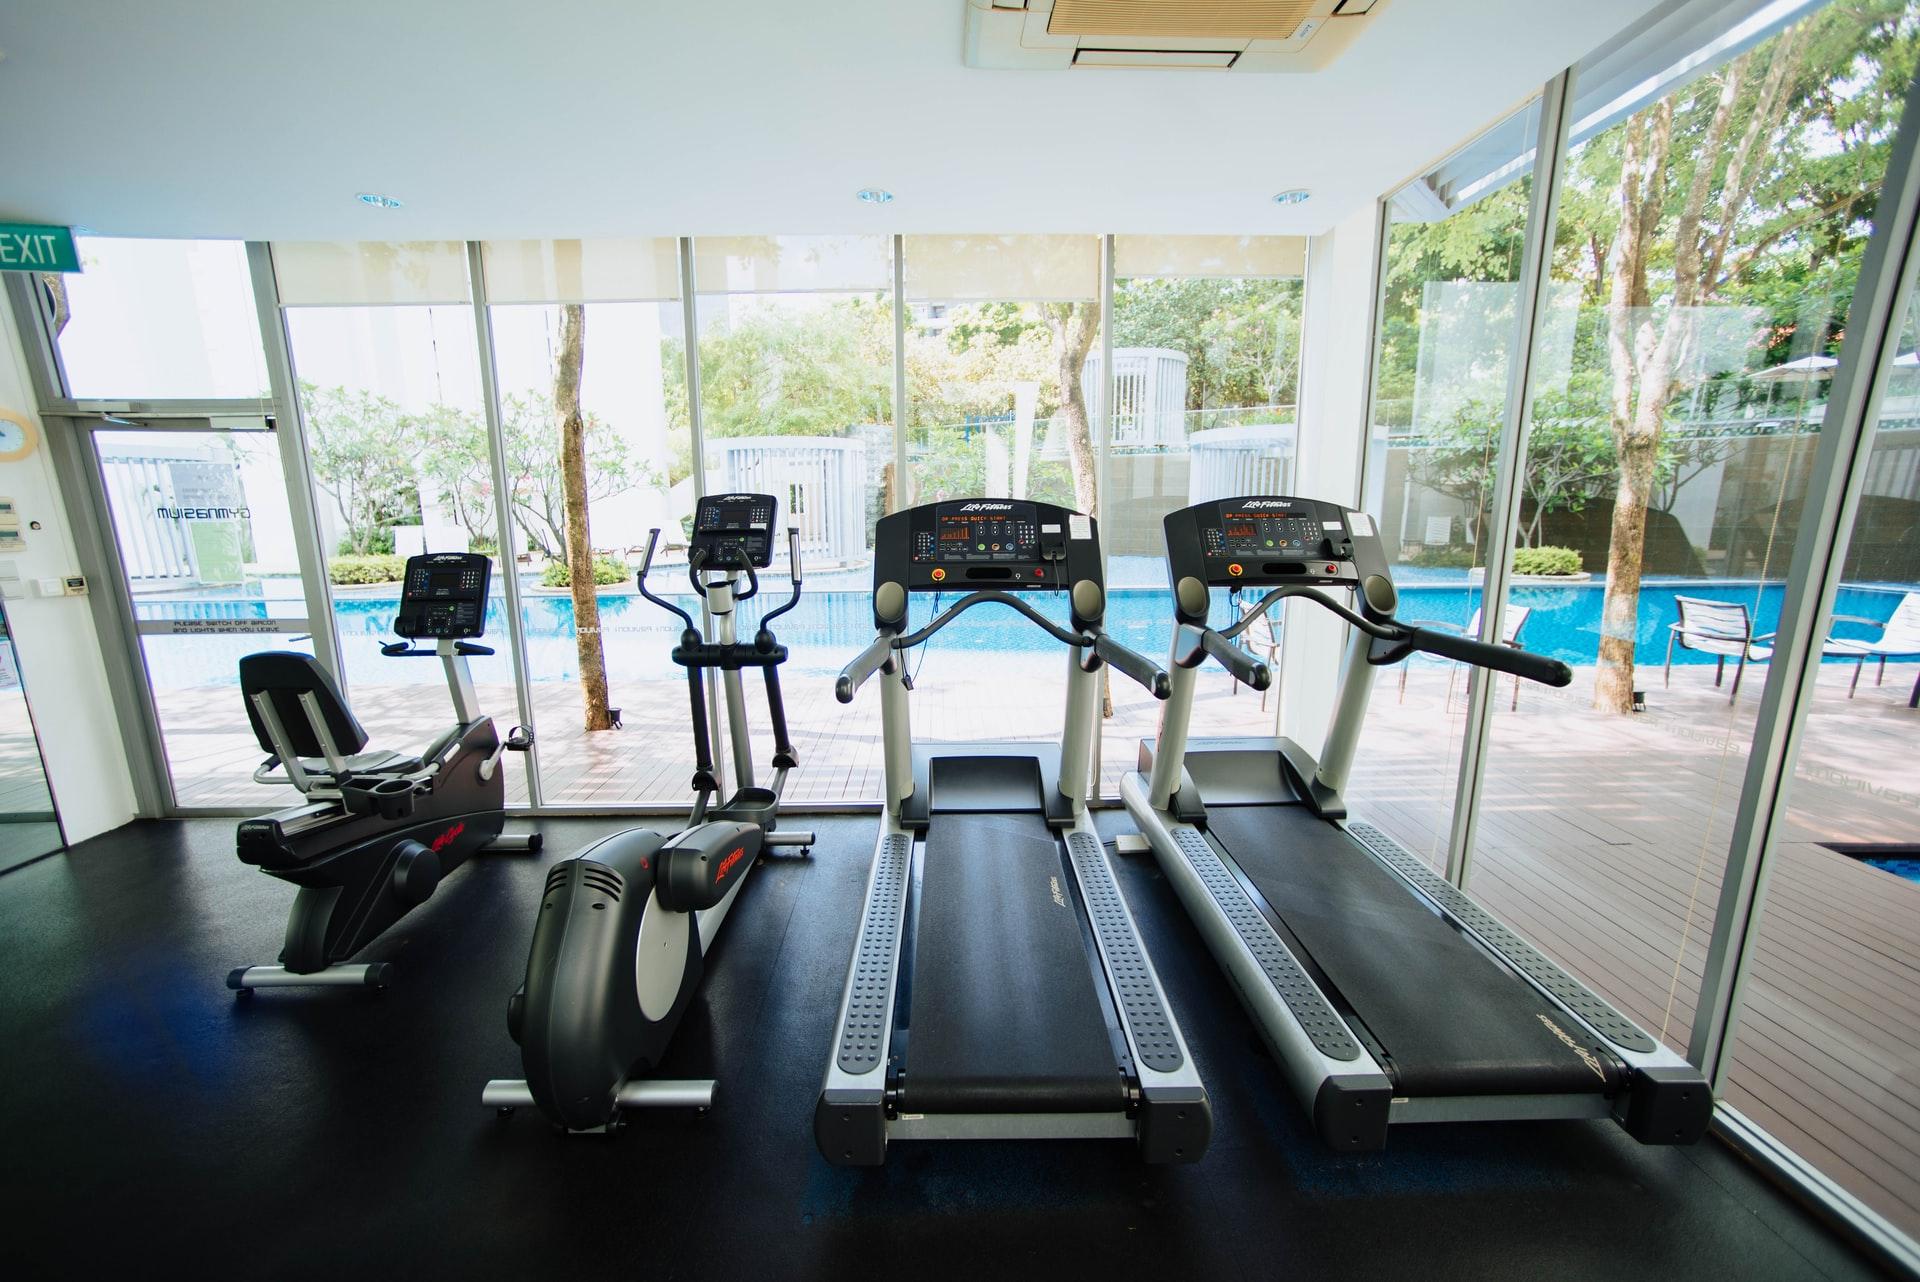 Cardio kit gym